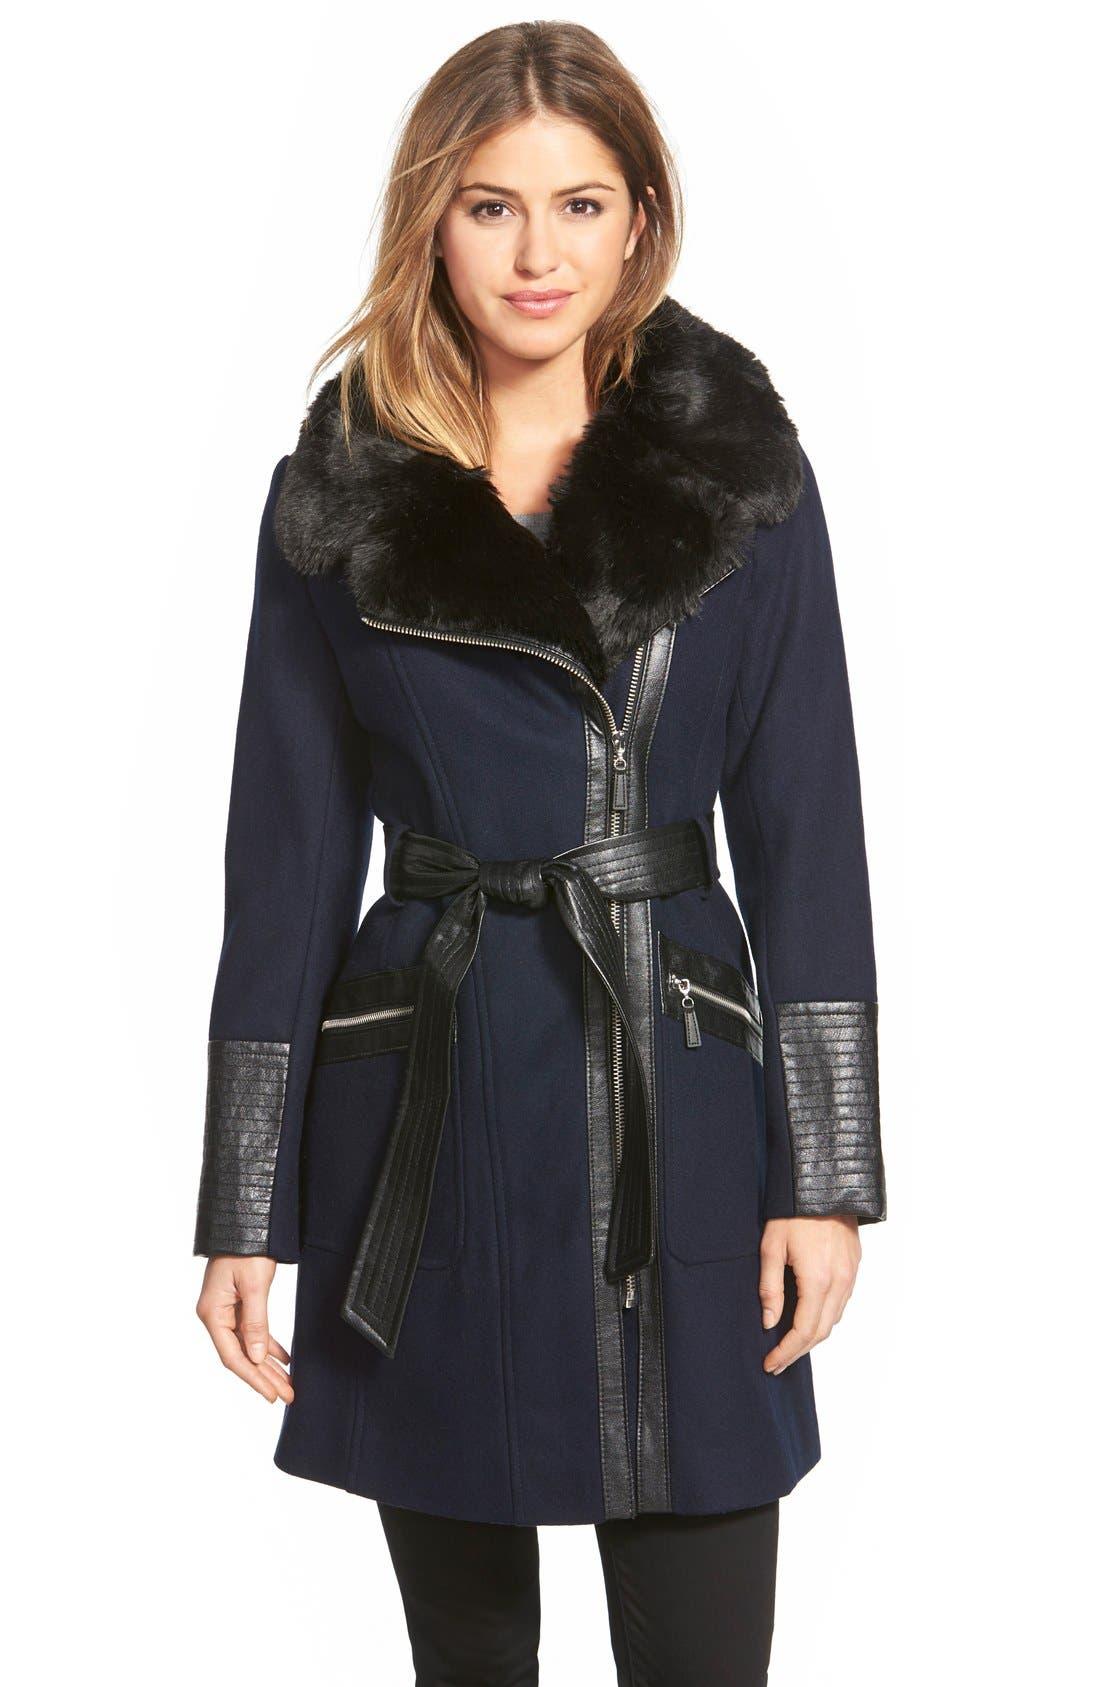 Main Image - Via Spiga Faux Leather & Faux Fur Trim Belted Wool Blend Coat